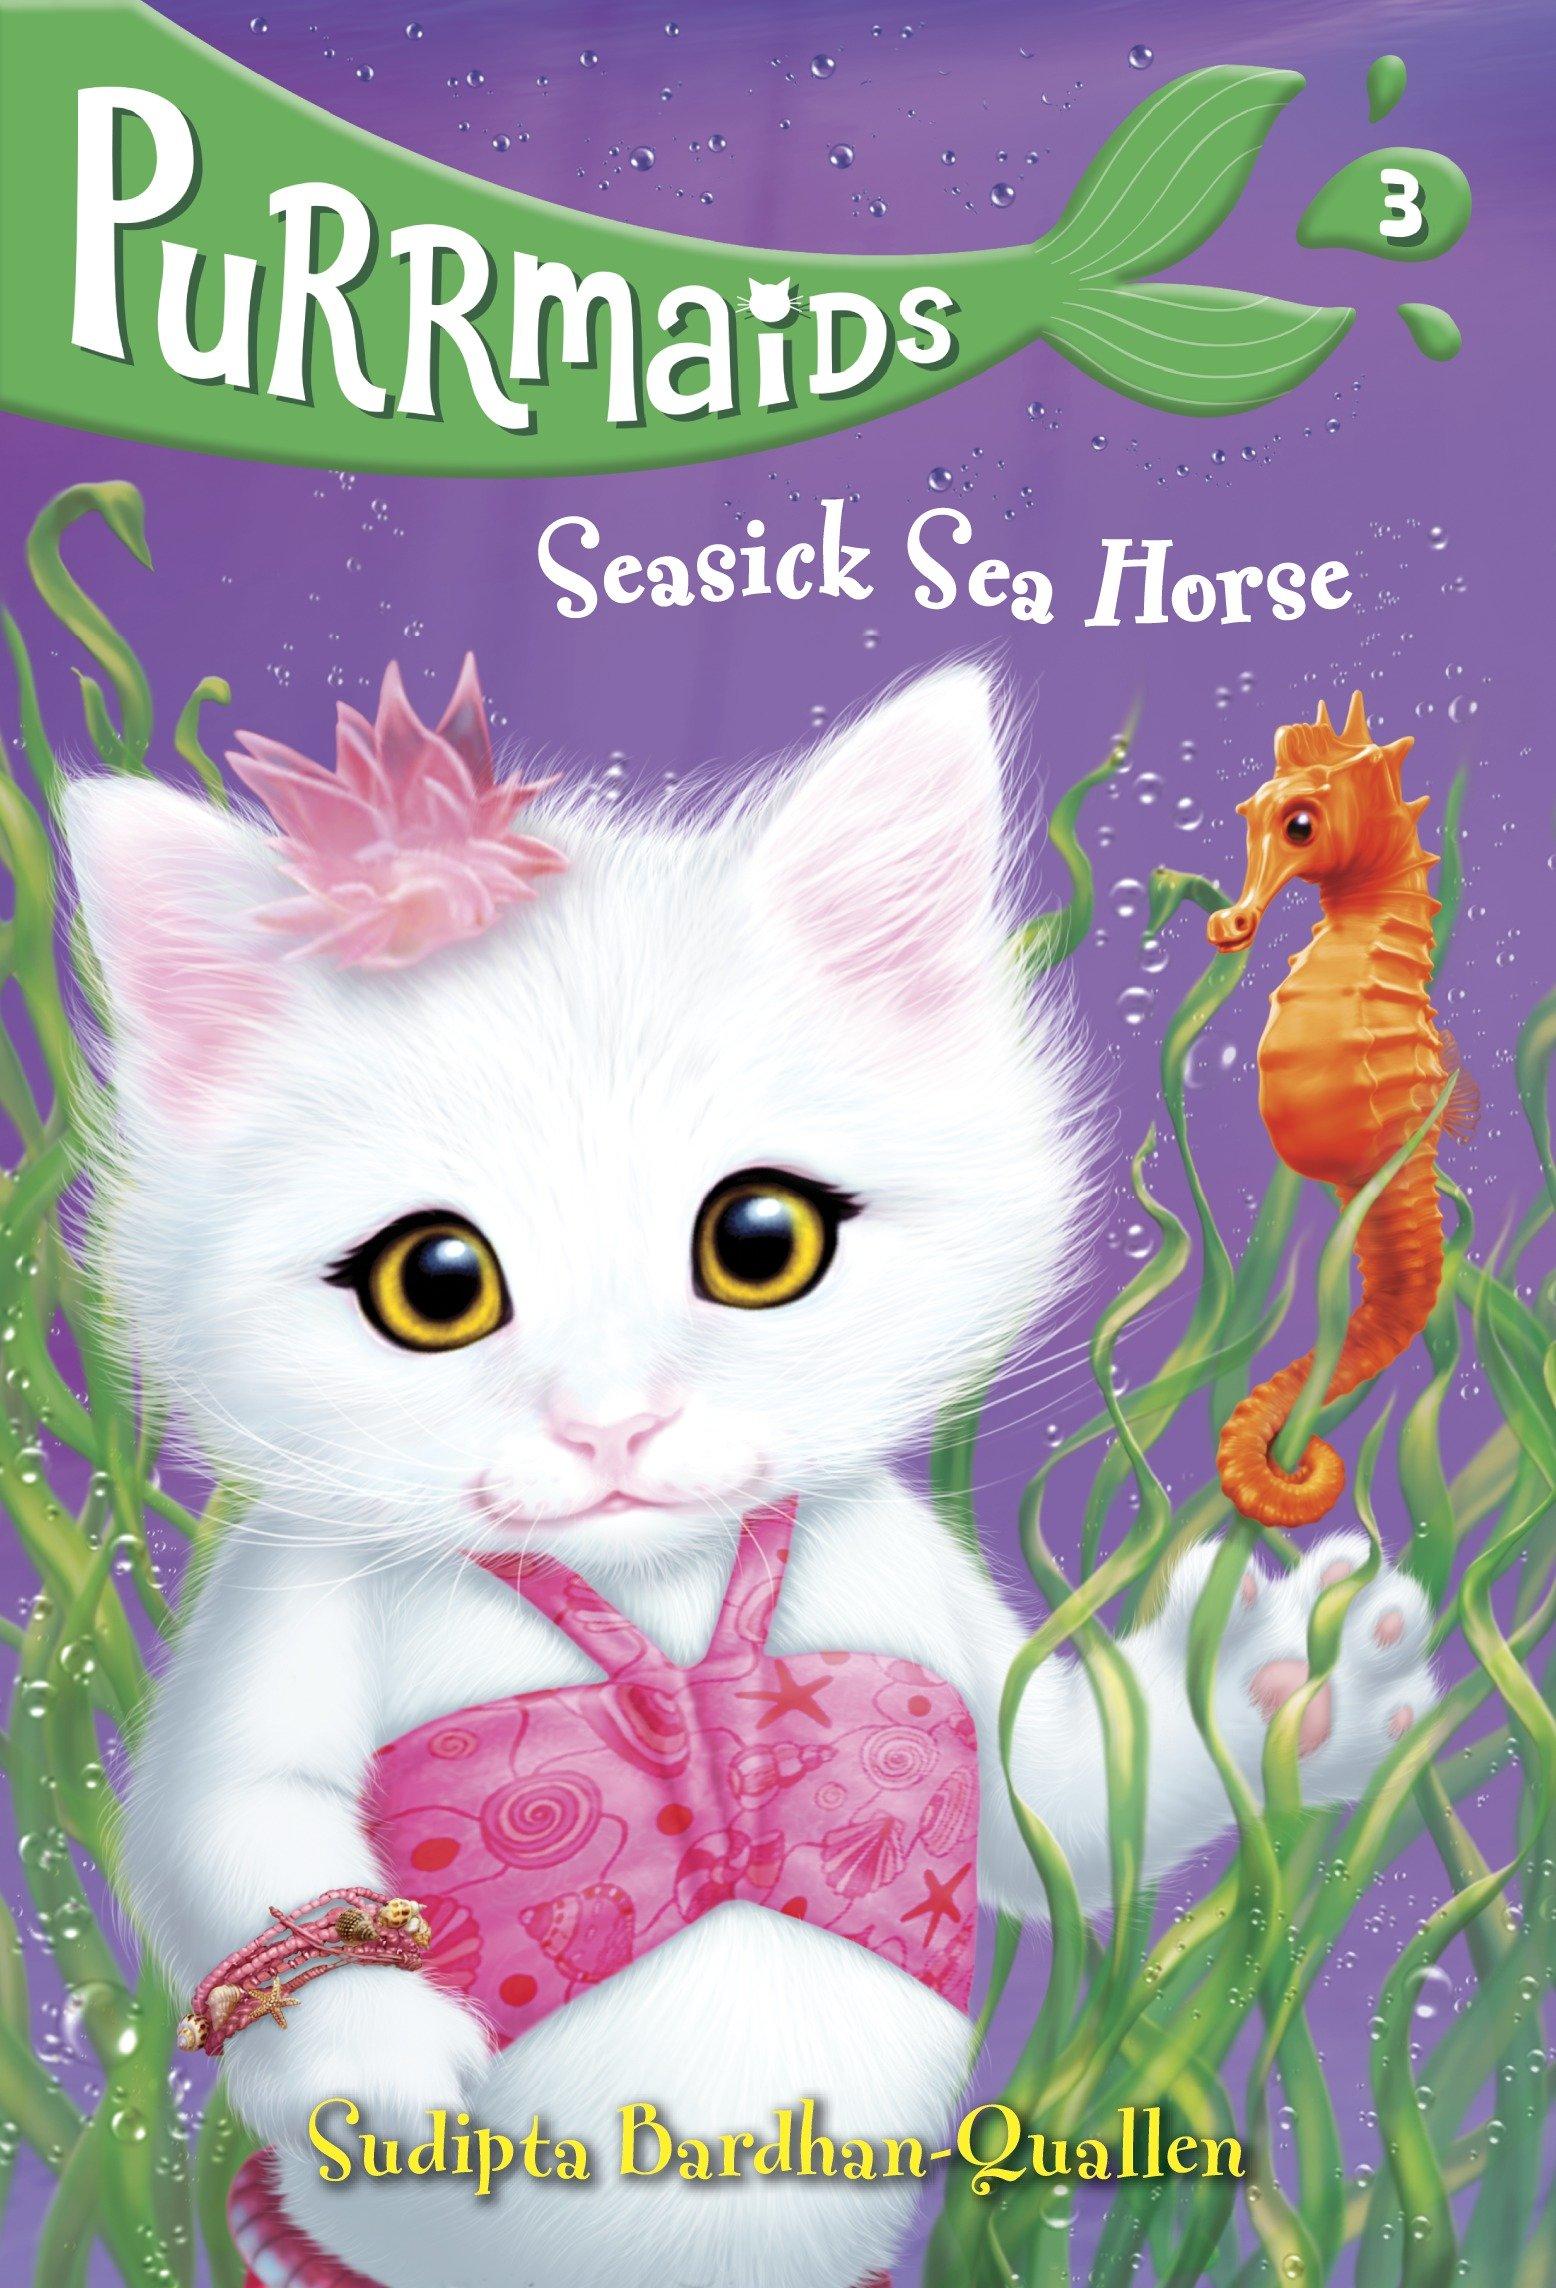 Cover Image of Purrmaids #3: Seasick Sea Horse